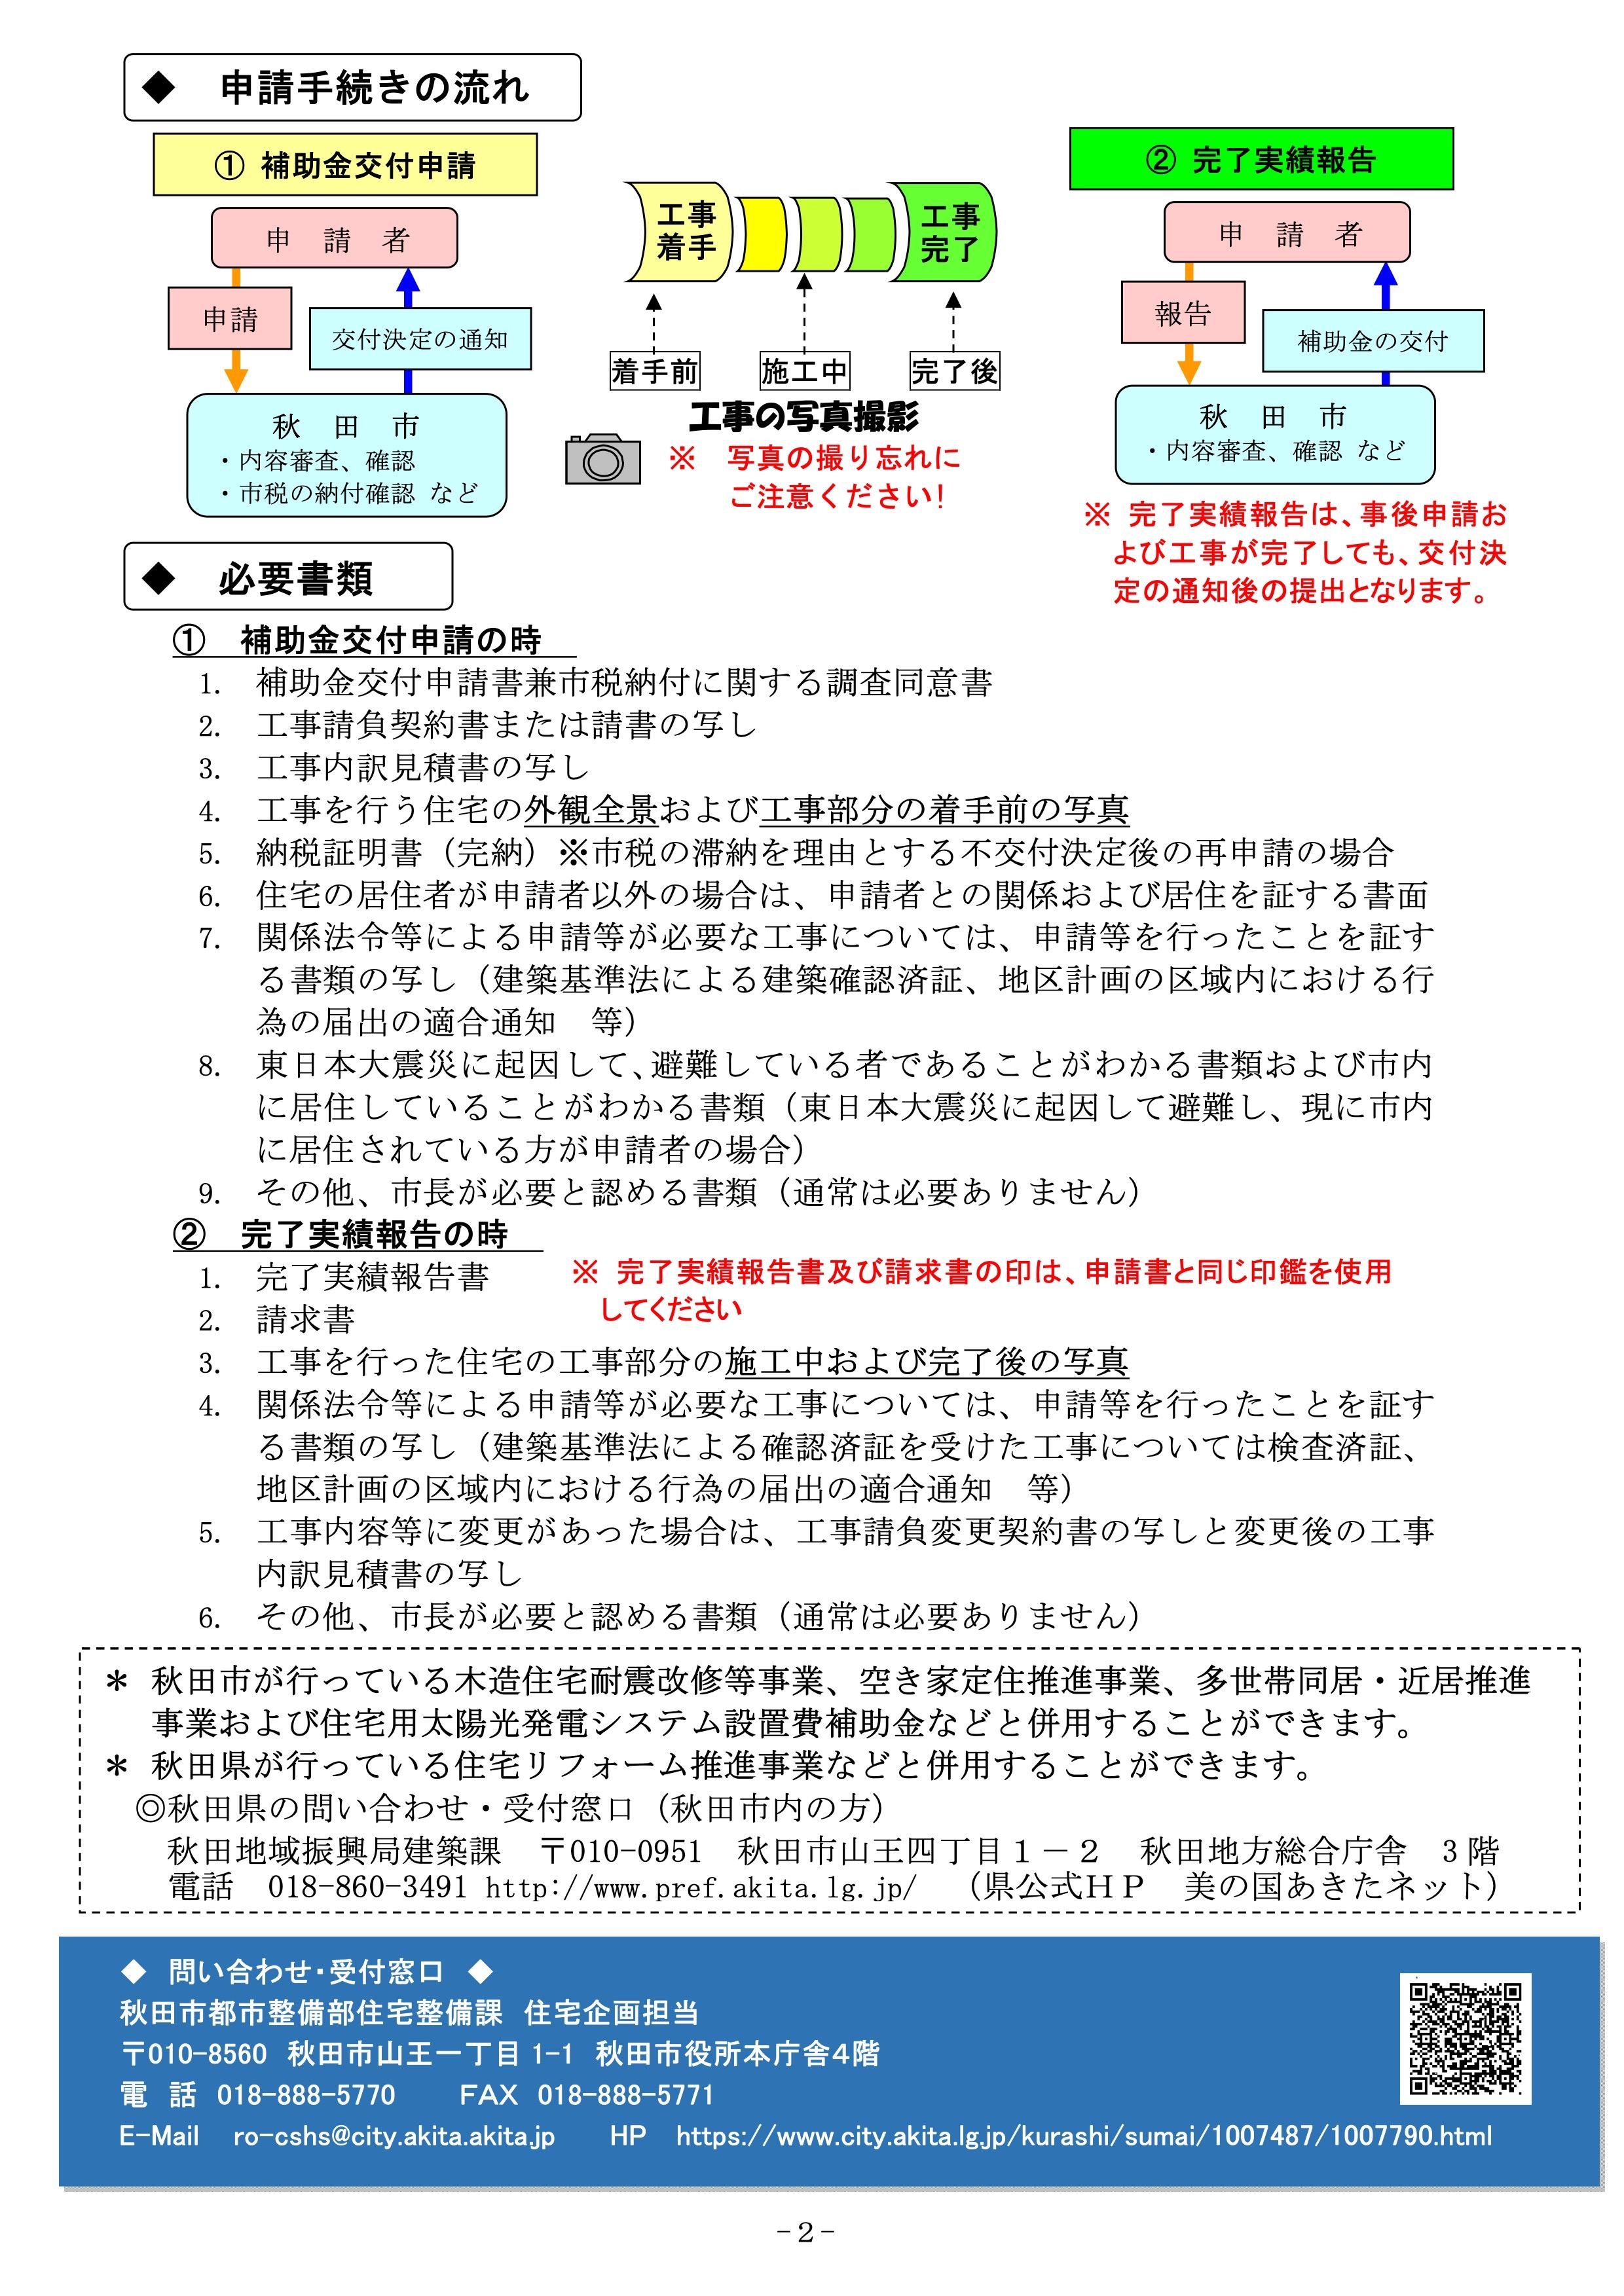 re02秋田市リーフレット 2